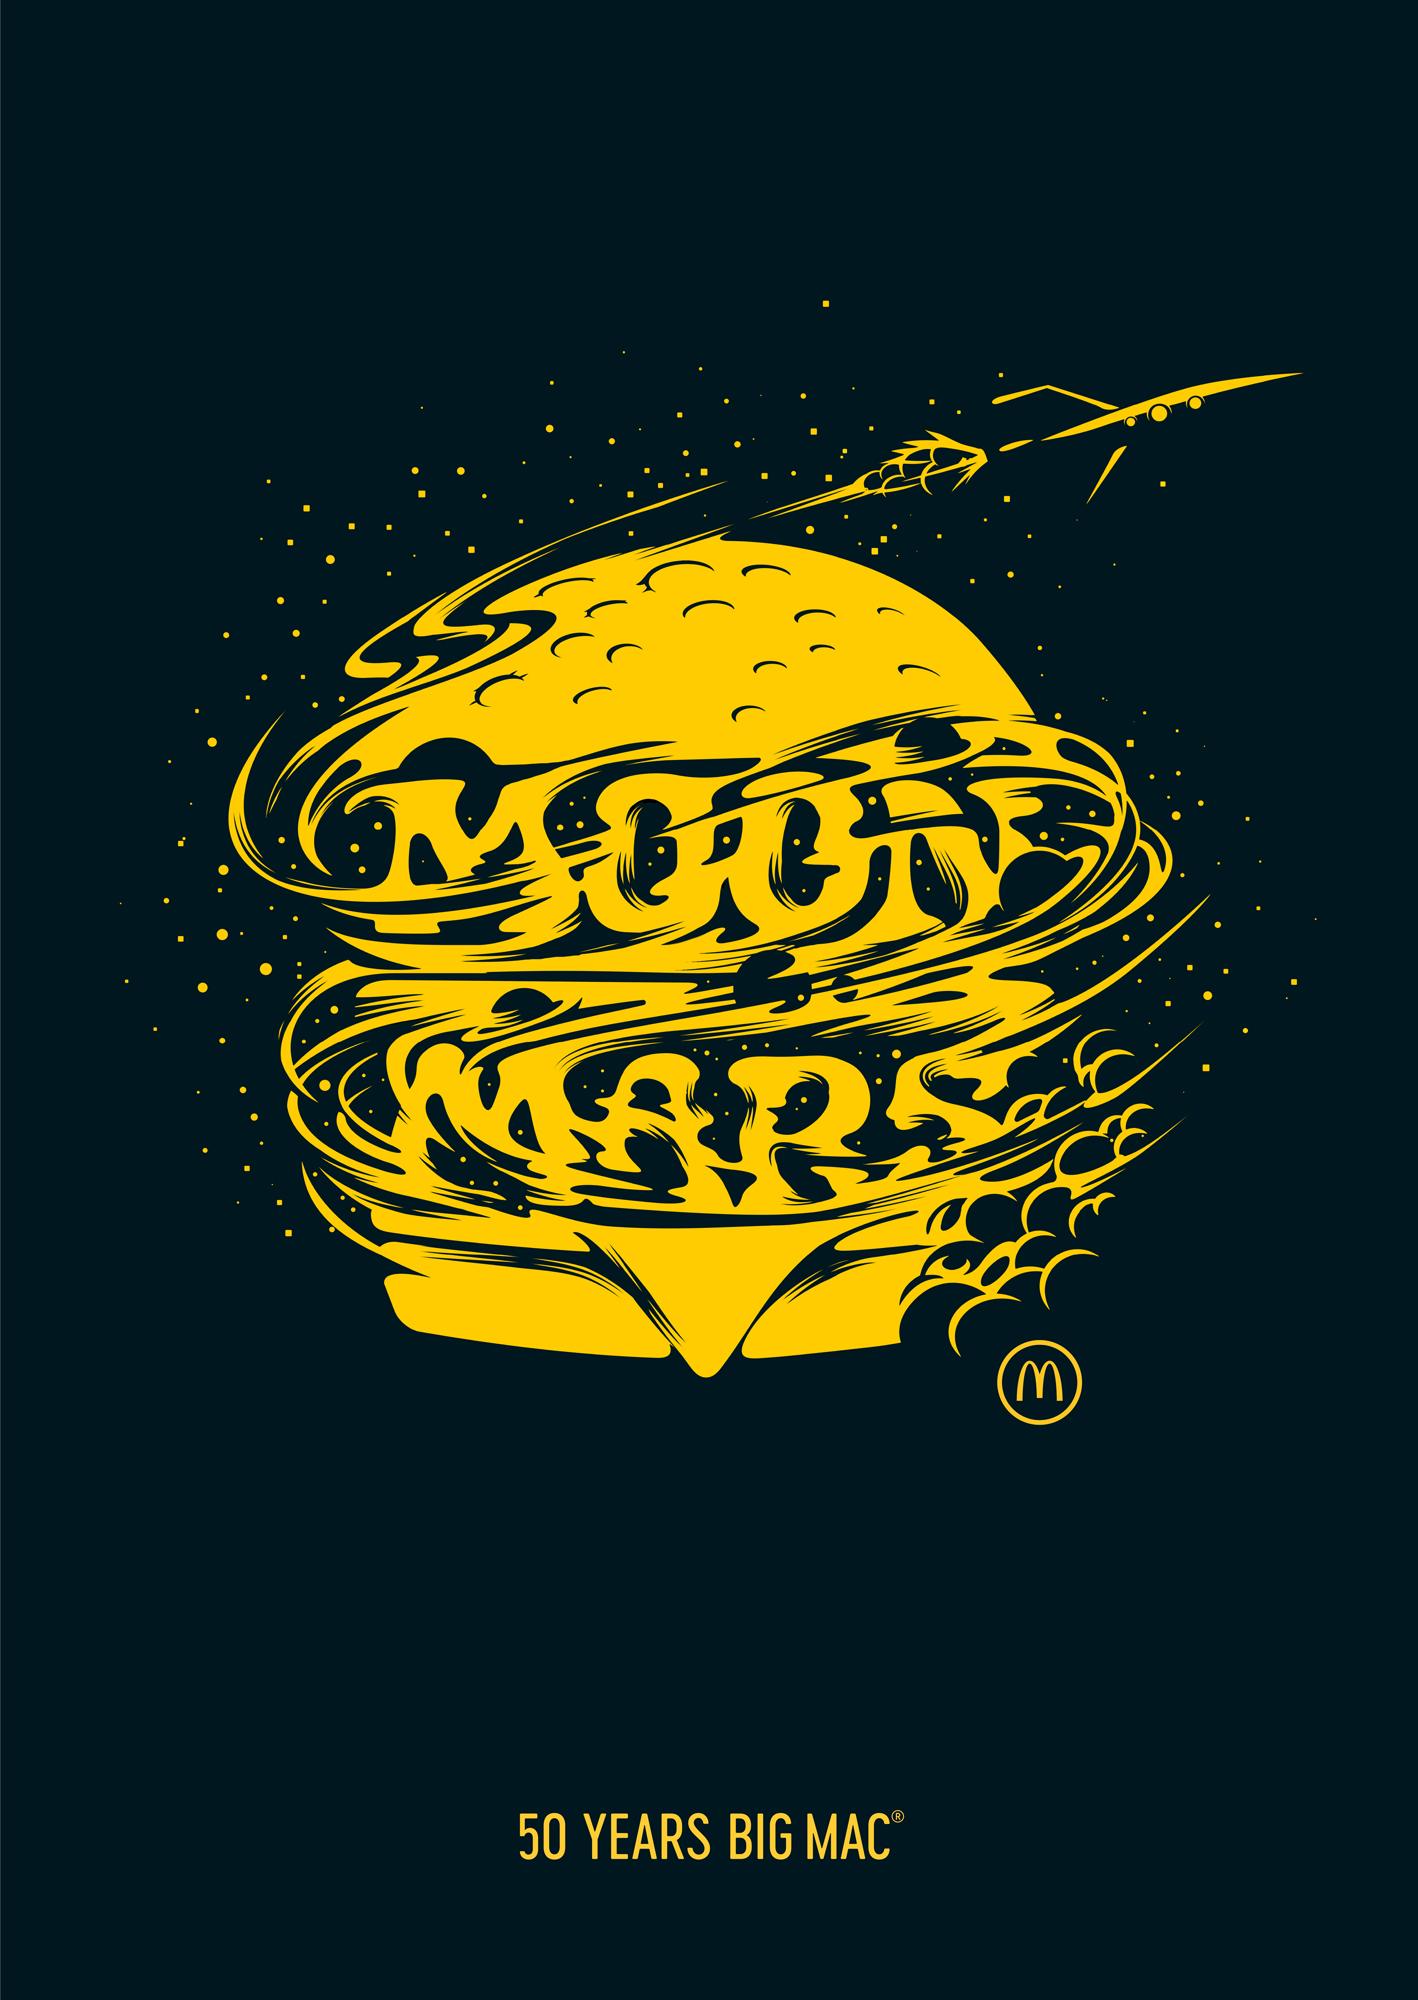 8_Moon_Mars.jpg